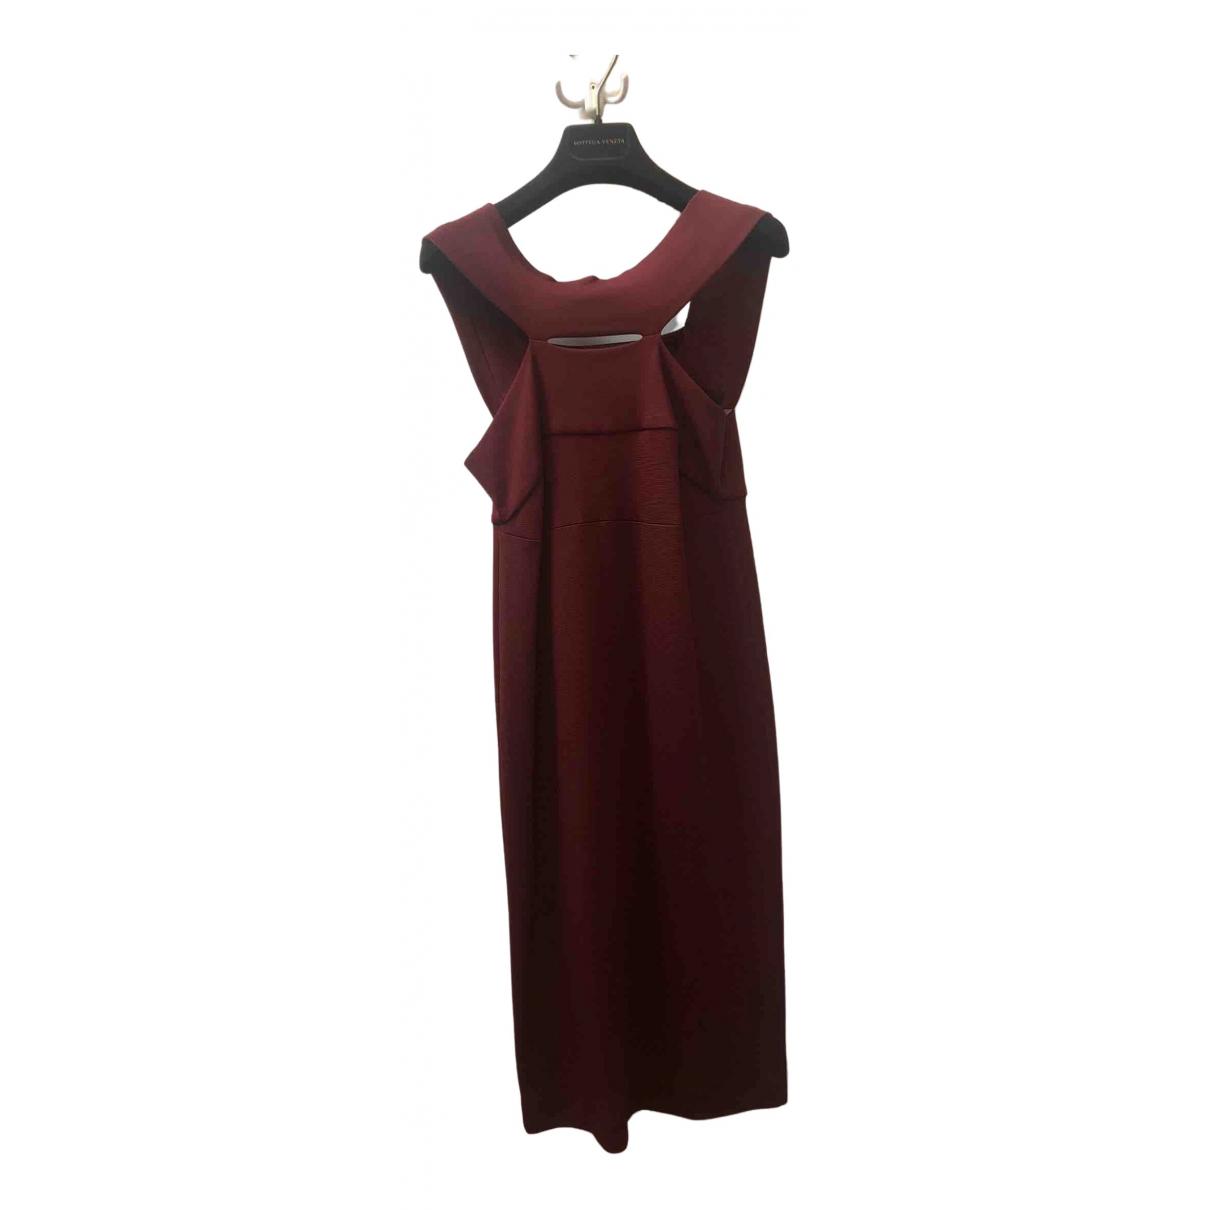 Bottega Veneta - Robe   pour femme en coton - bordeaux